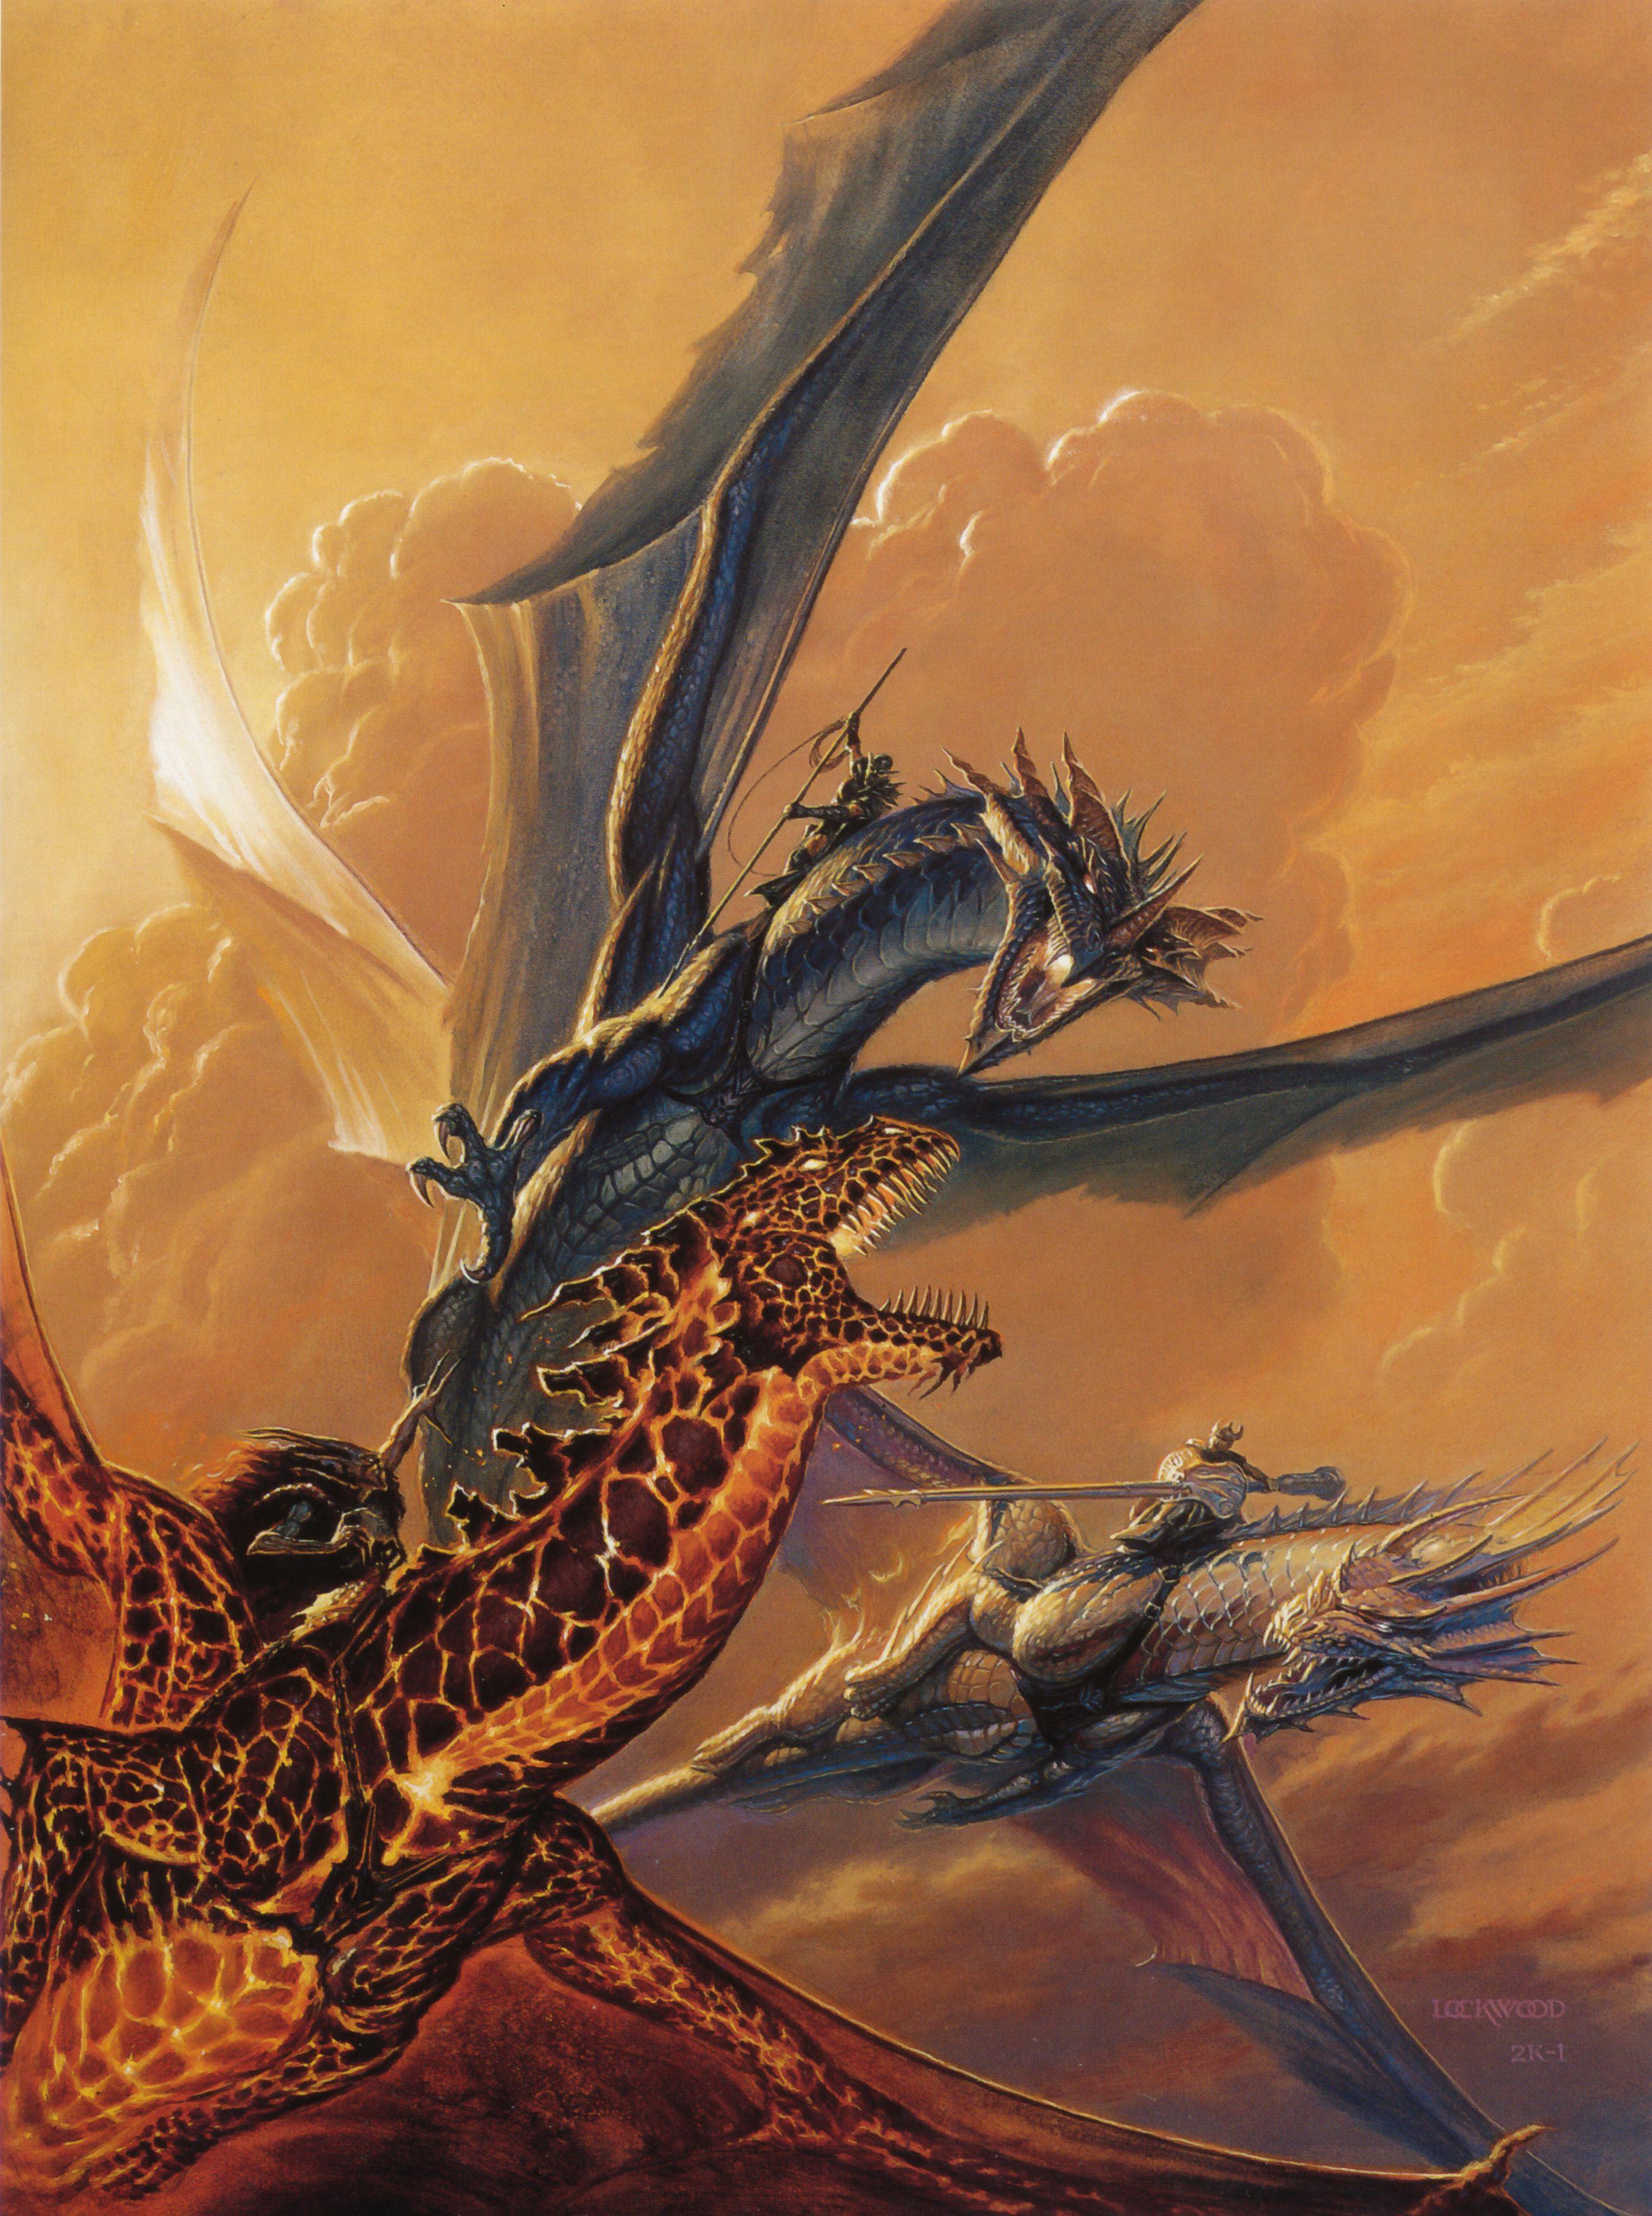 занимает рисунки фото дракона с мечом симферополе карте